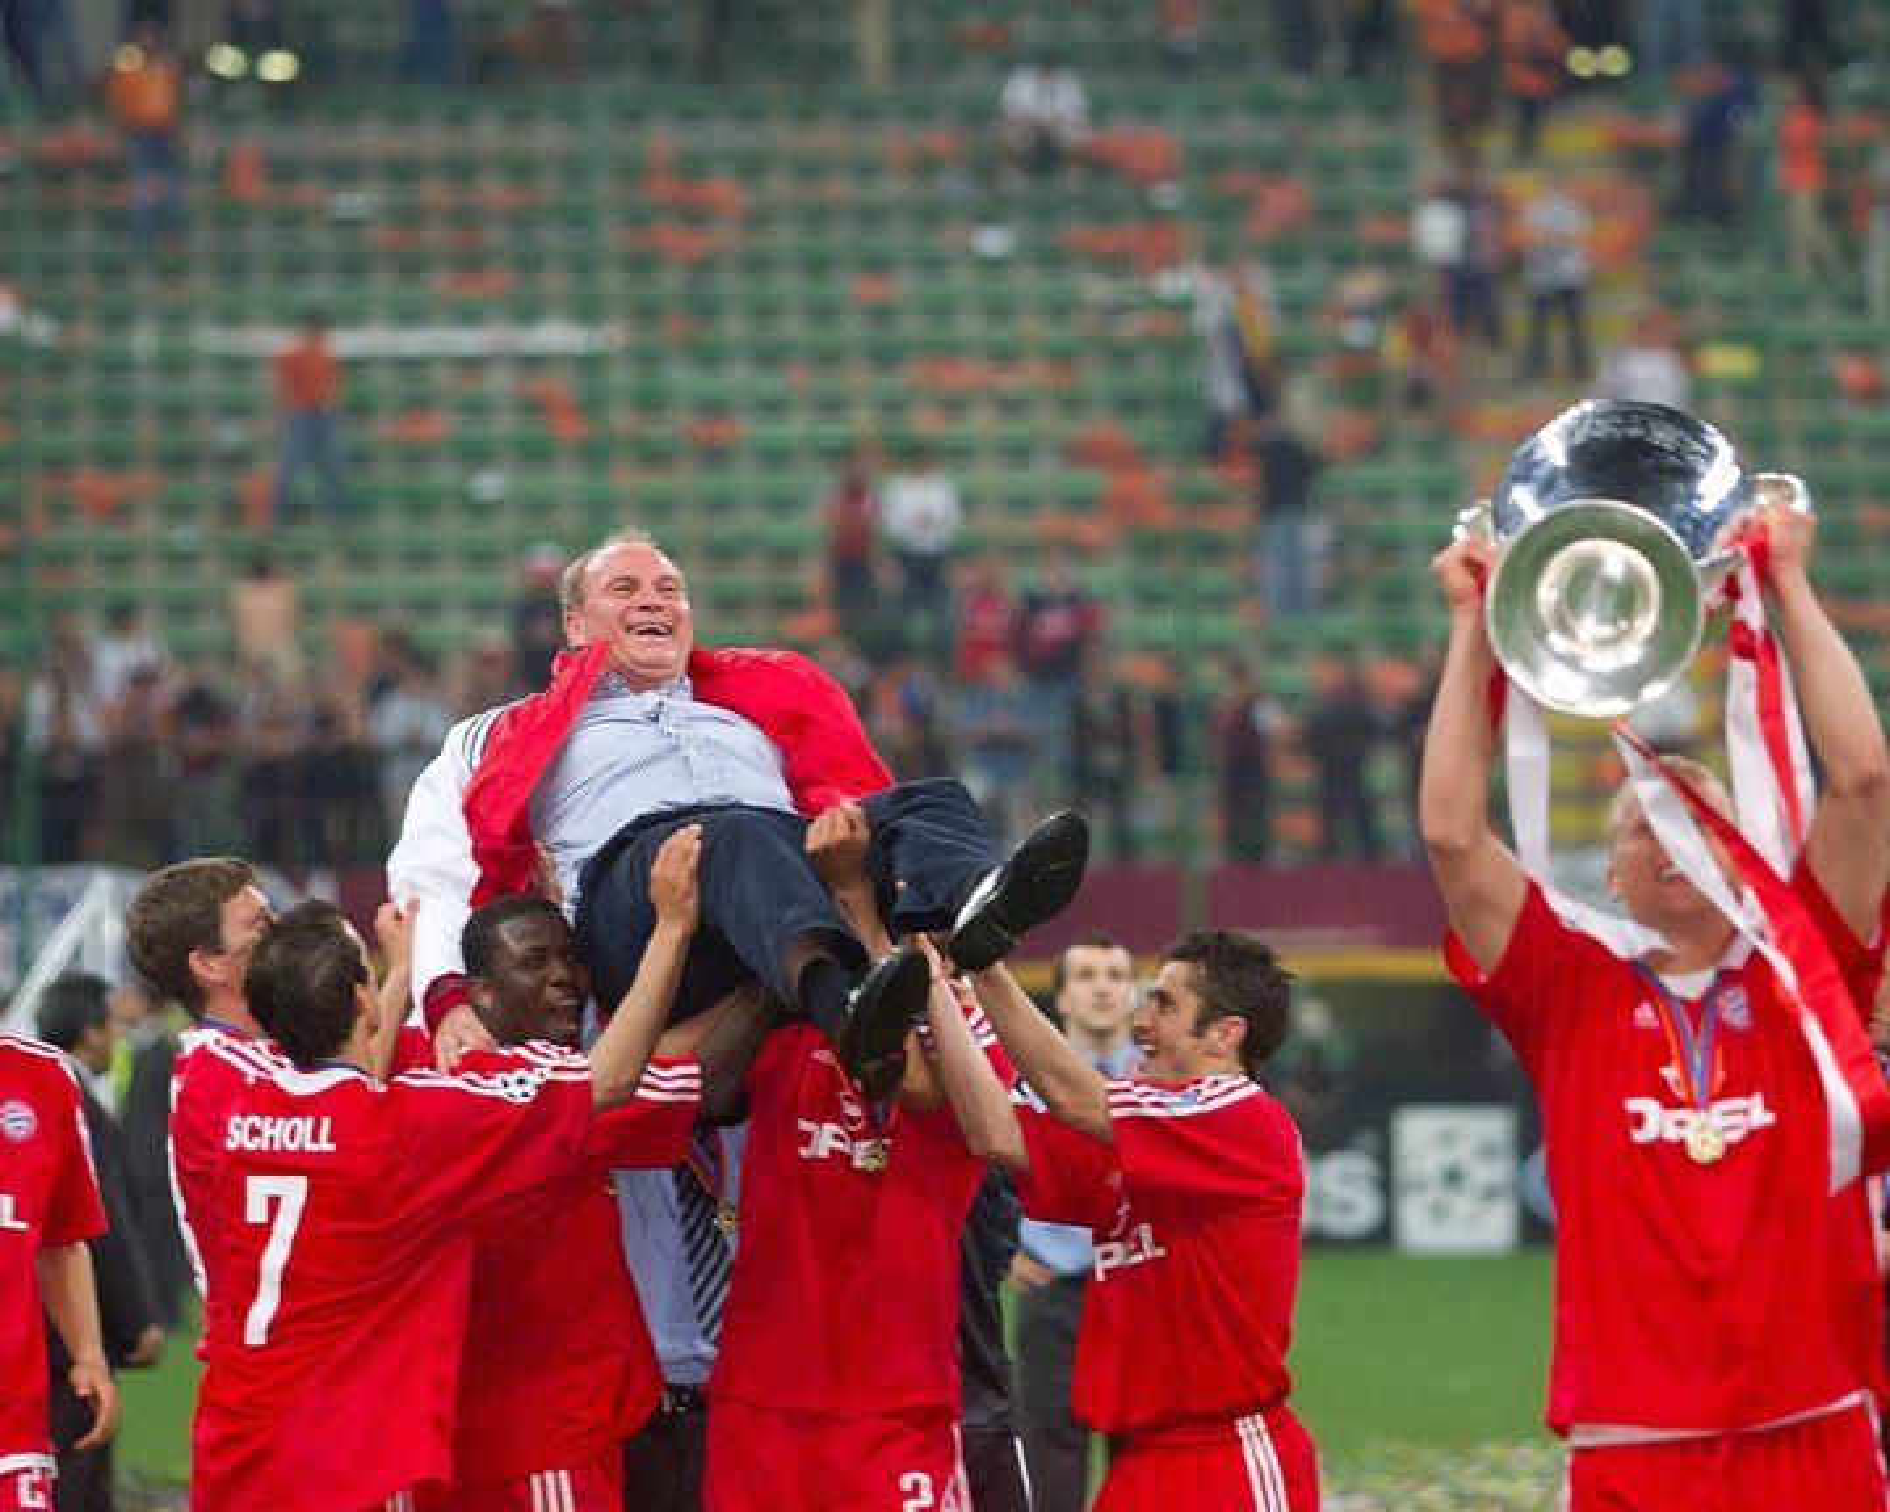 Bundesliga | Uli Hoeneß: The man who made Bayern Munich a